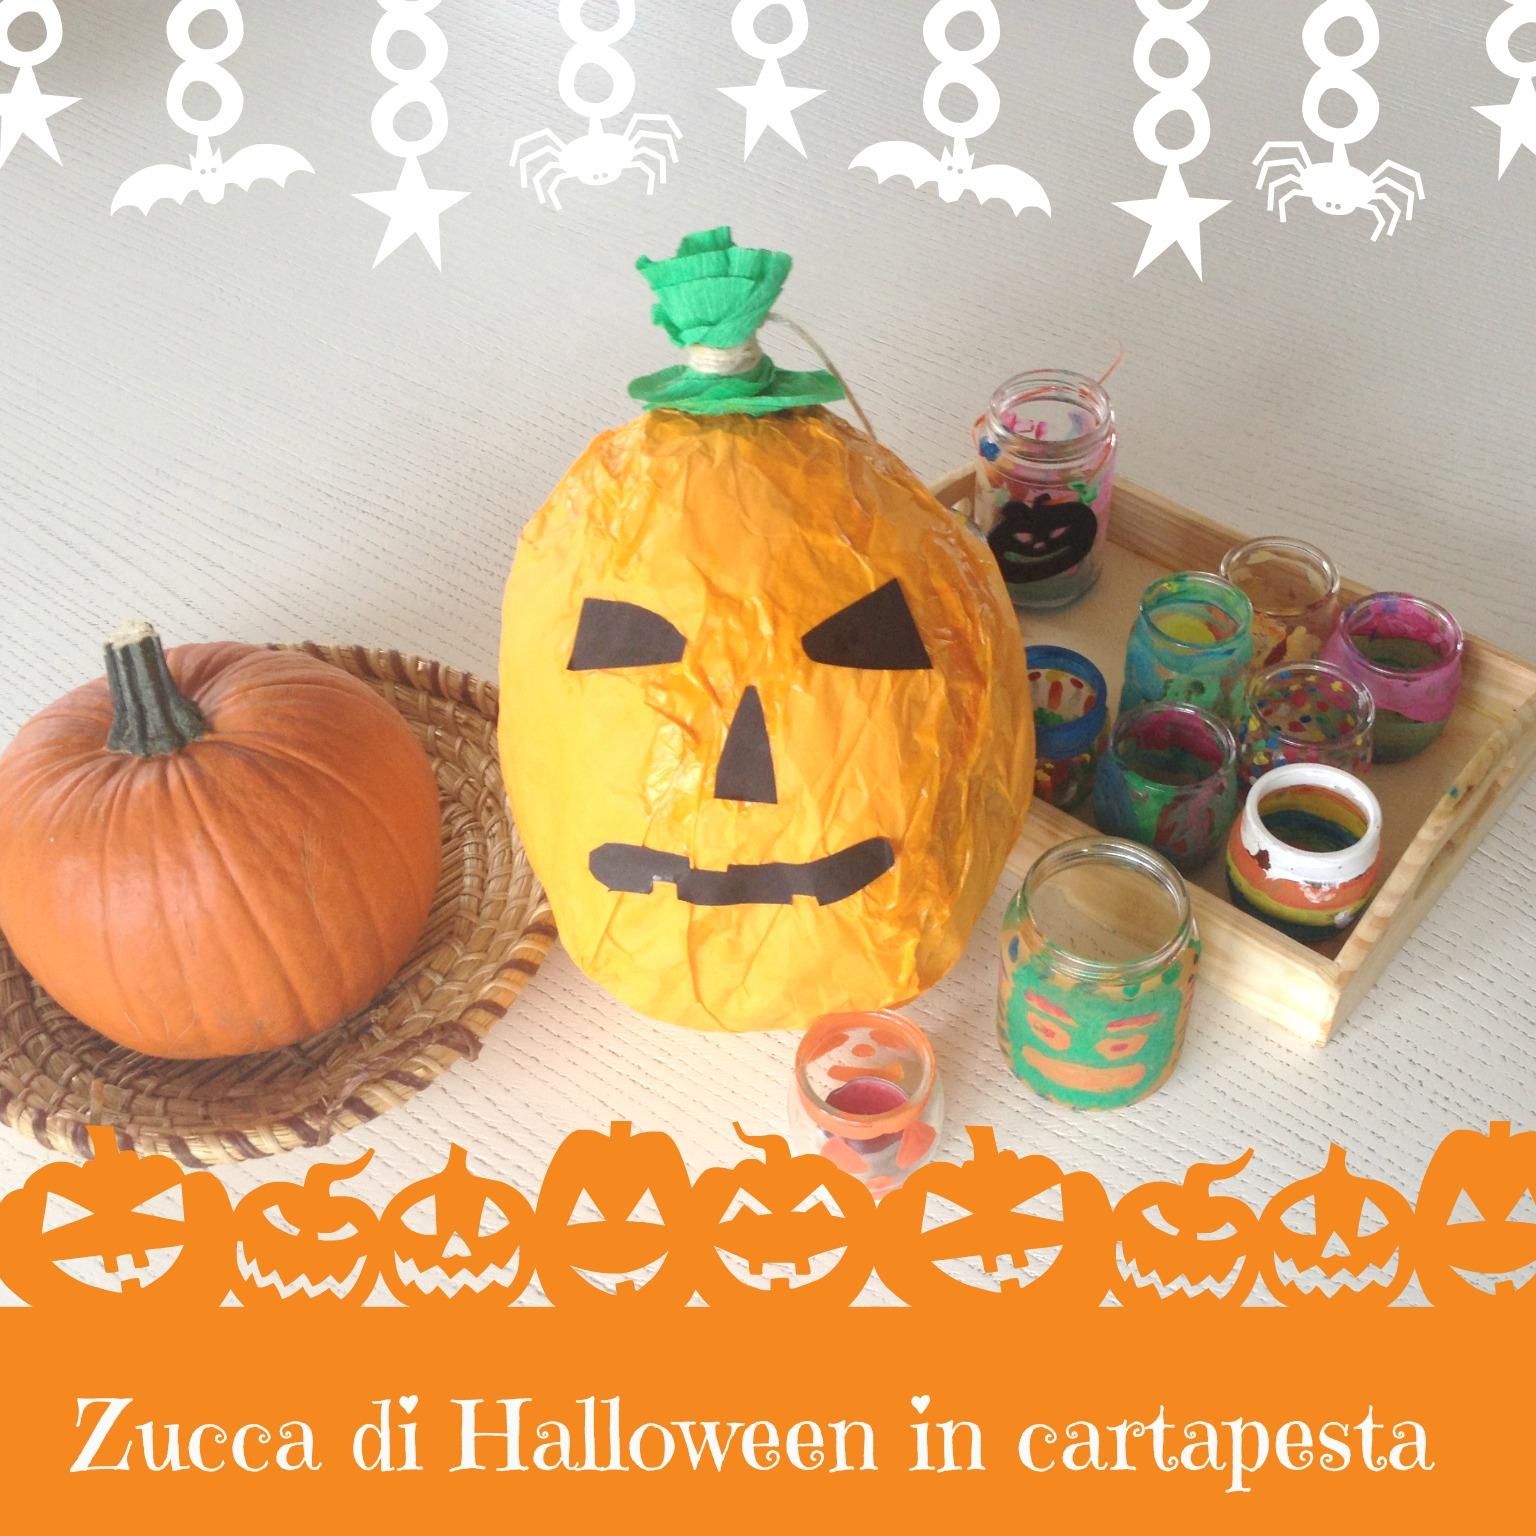 Zucca Halloween Cartapesta.Zucca In Cartapesta Per Halloween Babygreen